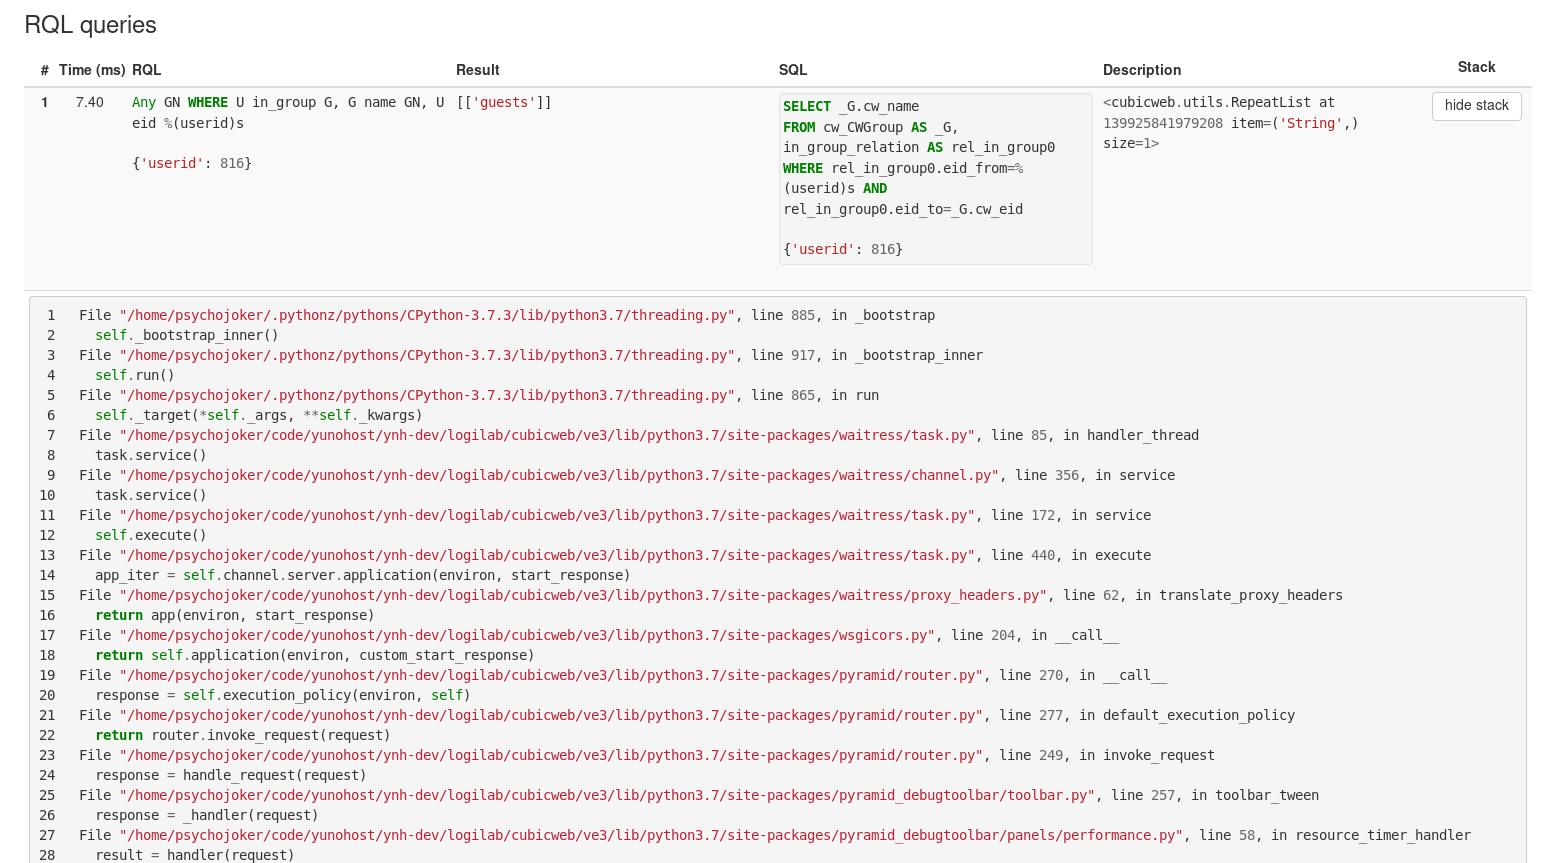 doc/_static/debugtoolbar_rql_traceback_panel.png